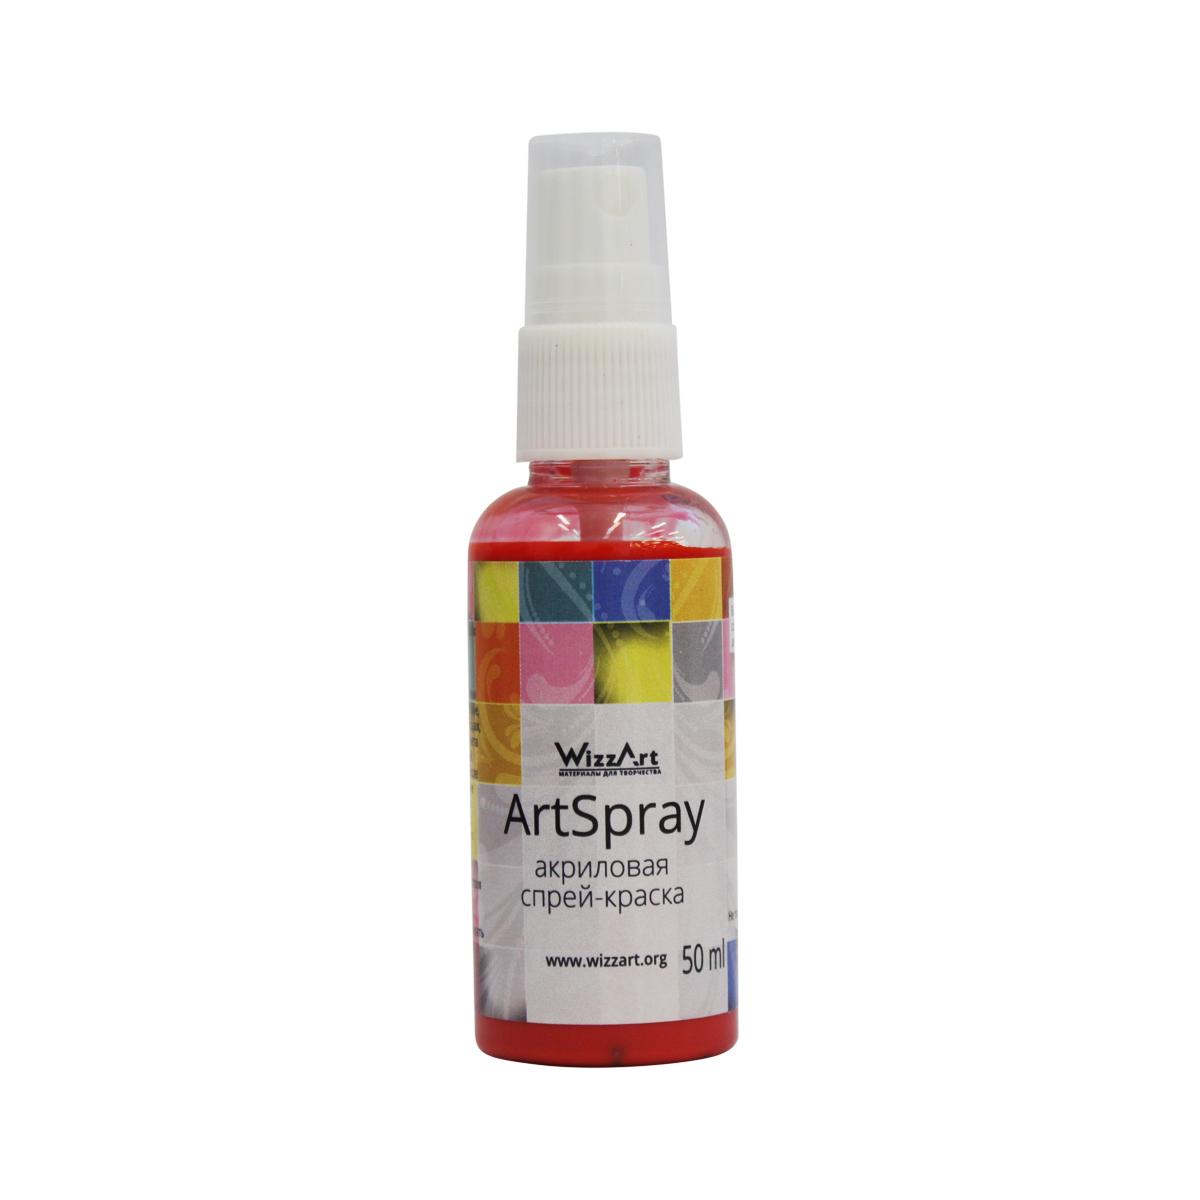 Краска-спрей акриловая Wizzart ArtSpray, цвет: гранат, 50 мл499968